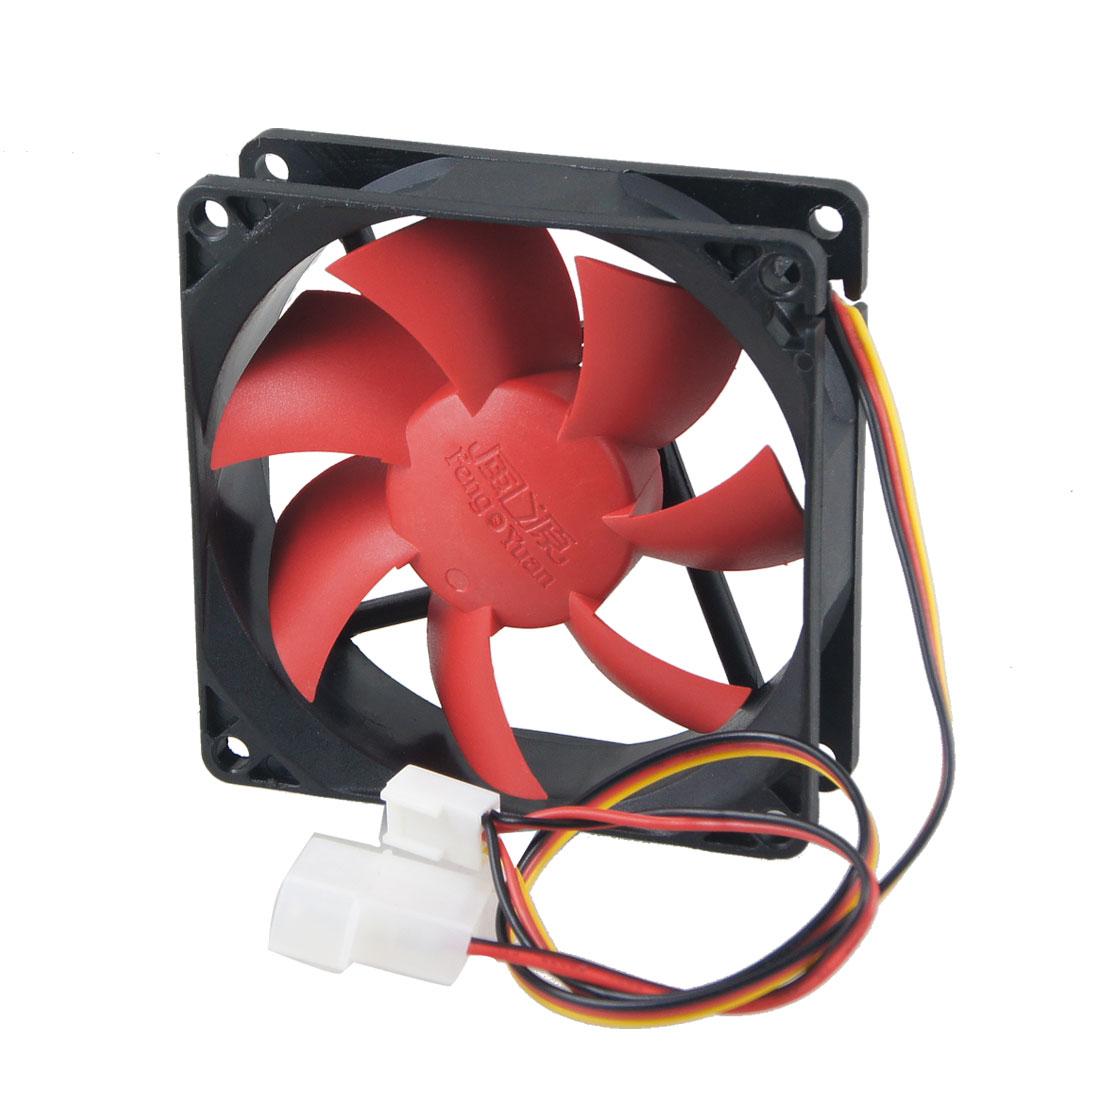 DC 12V 0.3A 3/4 Pin Black Red Square Shape Plastic PC Cooling Fan